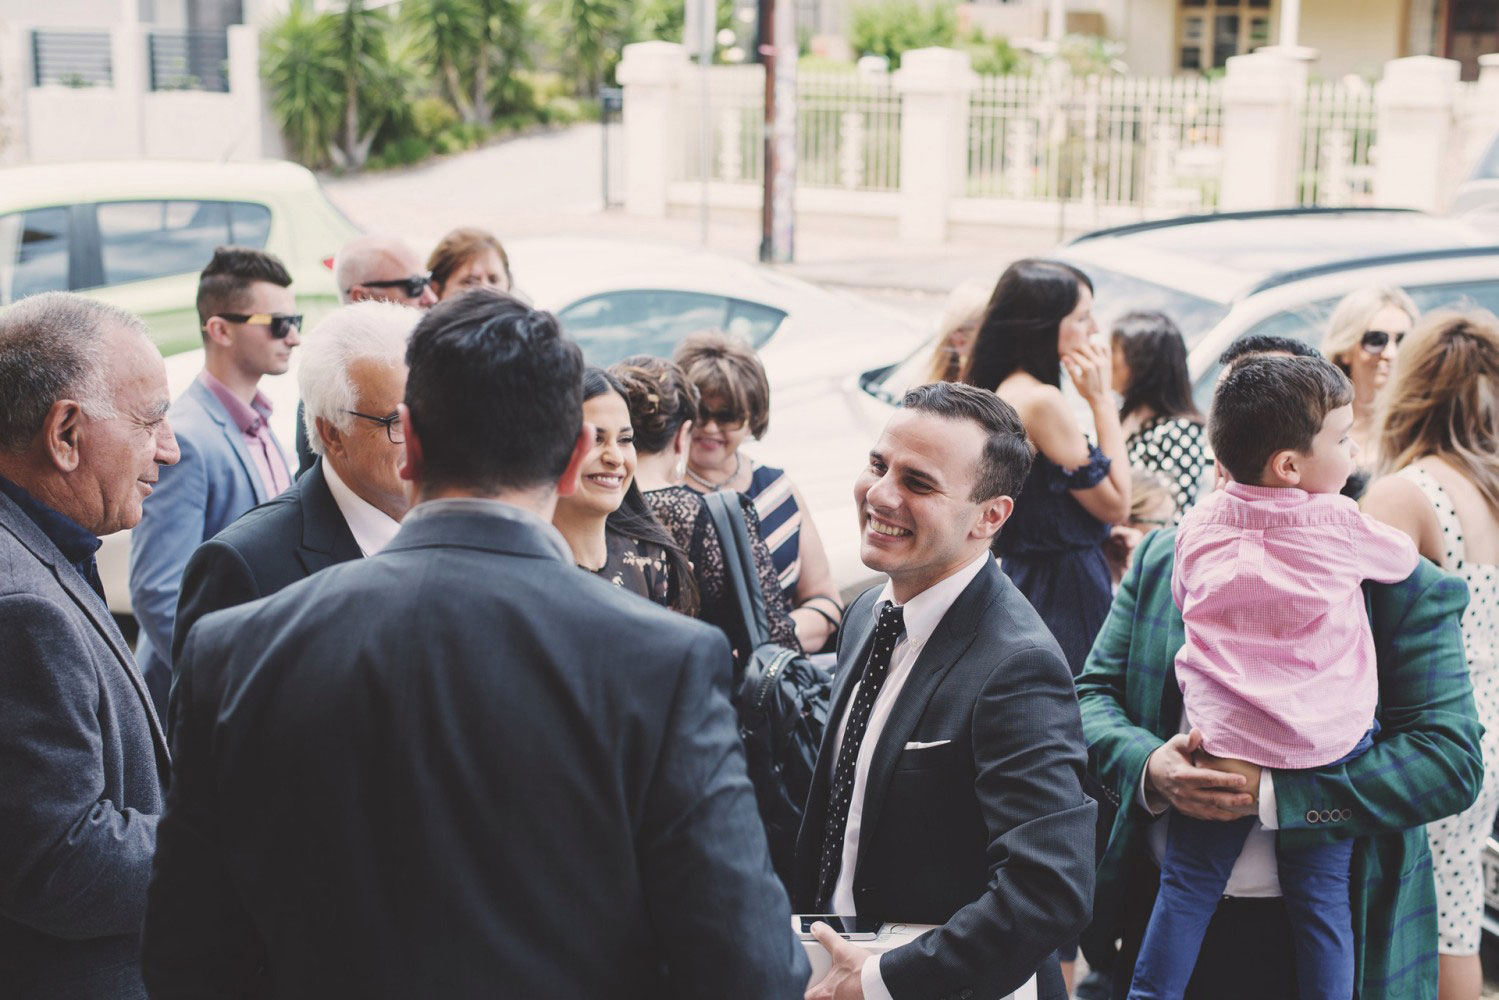 Jessica-Lemon-Photography-Adelaide-Wedding-Baptism-Christening-Engagment-Event-Photographer.jpg